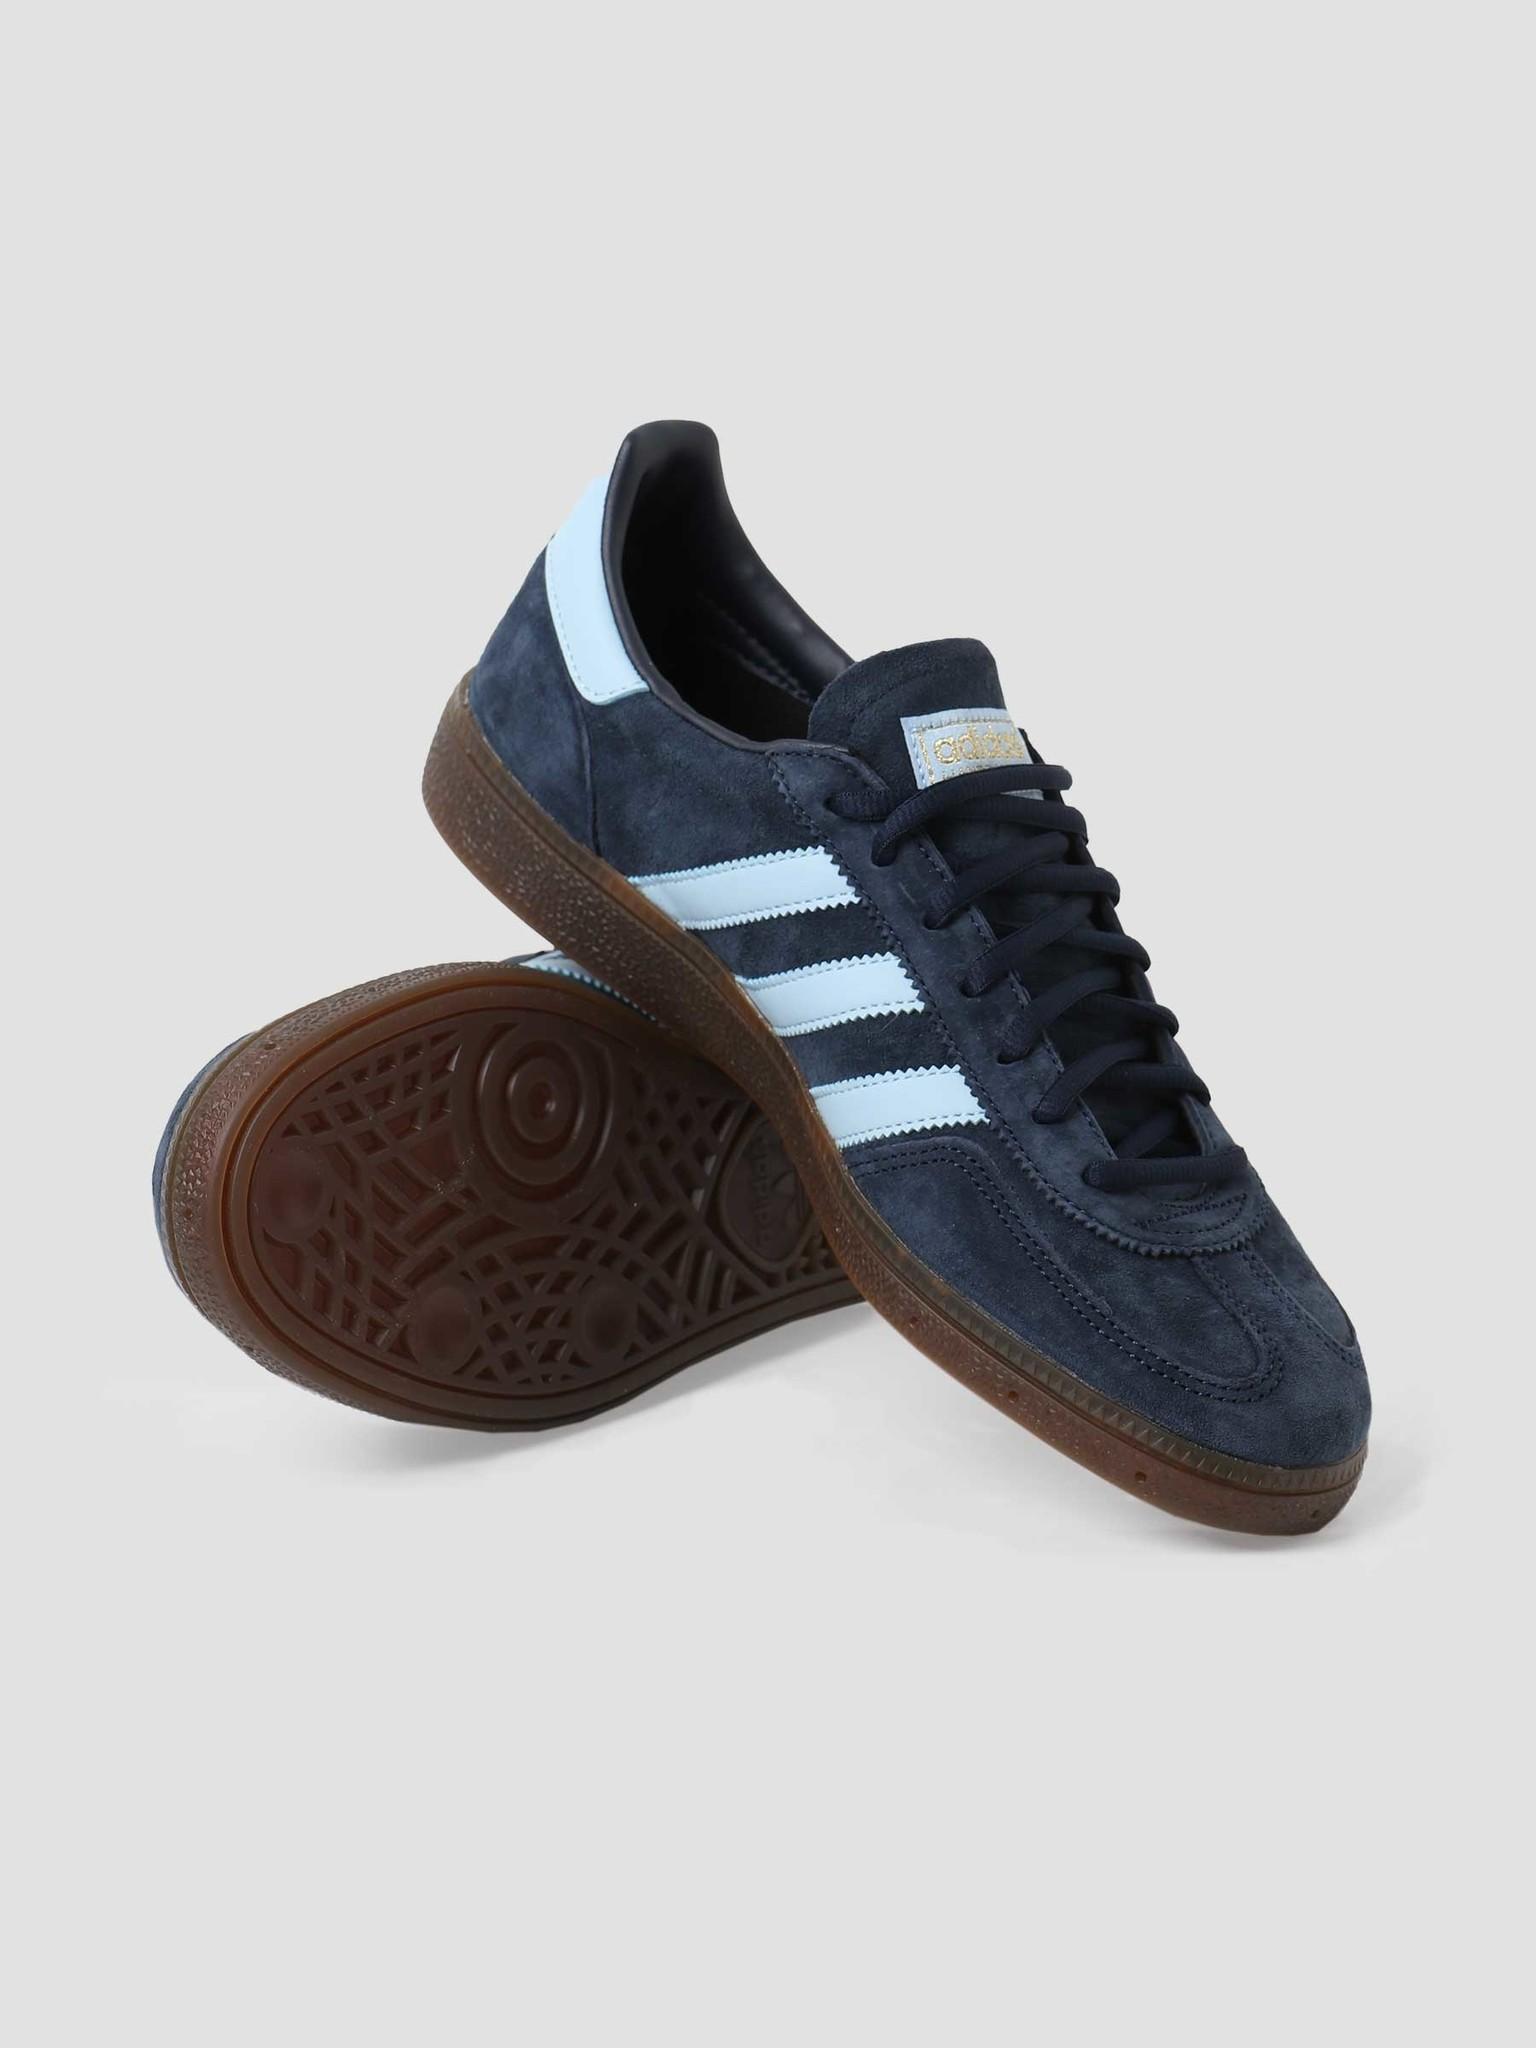 adidas handball spezial bd7633